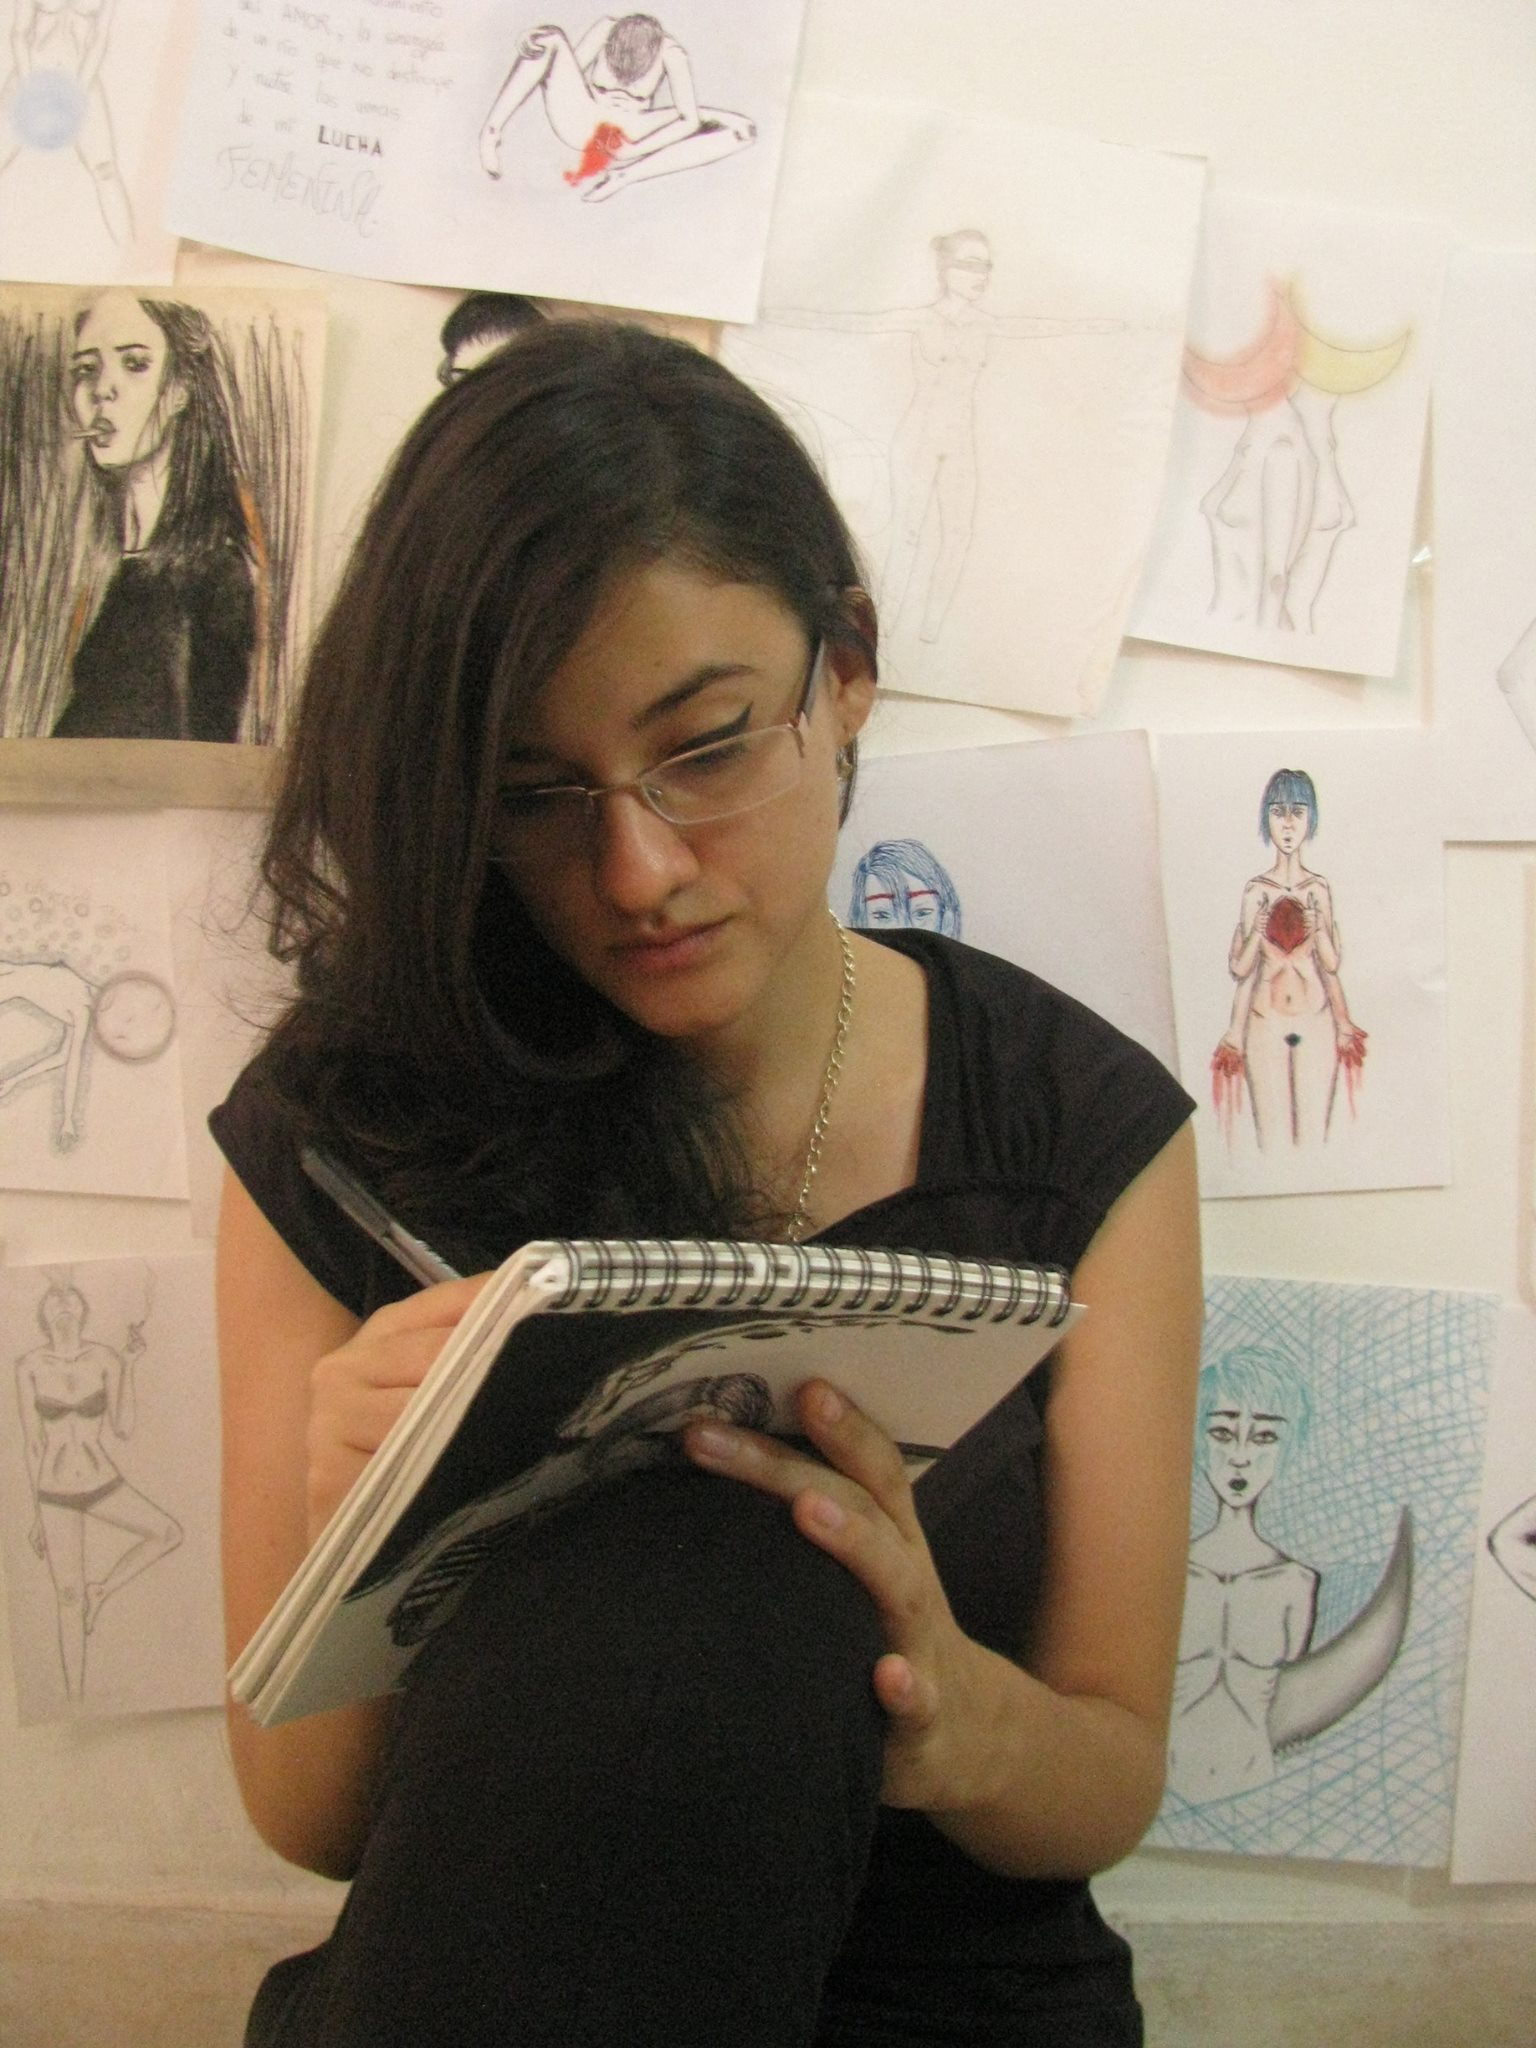 Antología de nóveles escritores (Maria Alejandra Rodríguez Gutiérrez: Prosa)